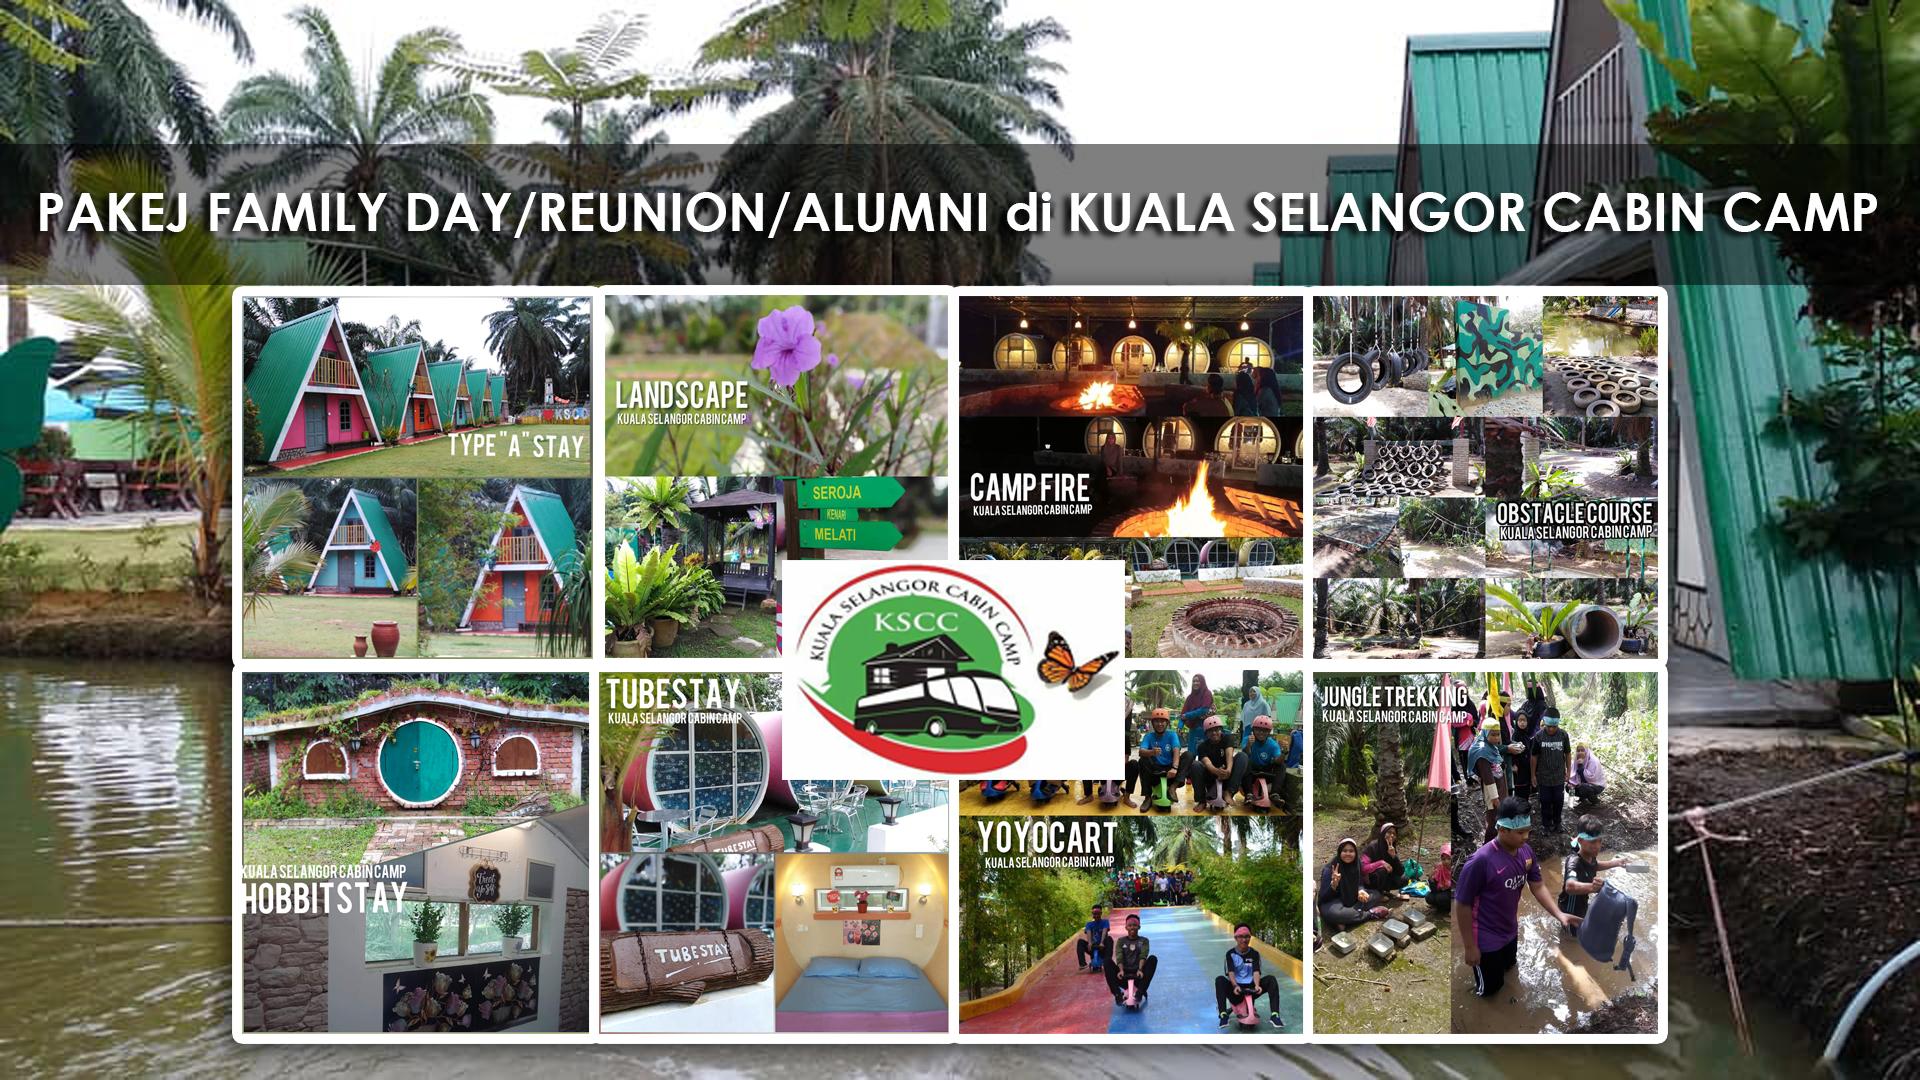 kuala-selangor-cabin-camp-(PAKEJ-FAMILY-DAY)